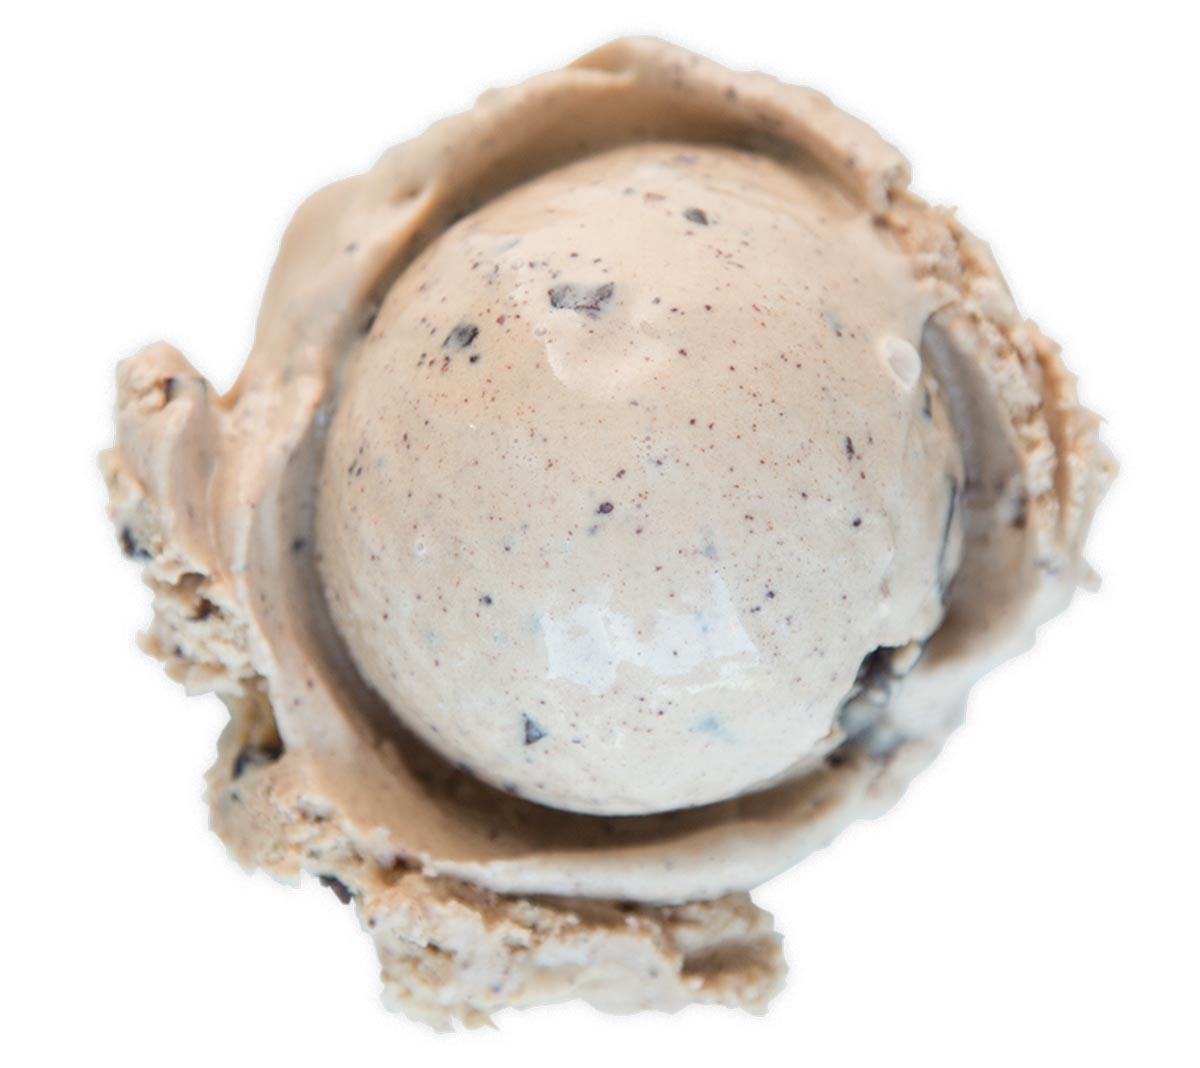 Photographs courtesy of Clumpies Ice Cream